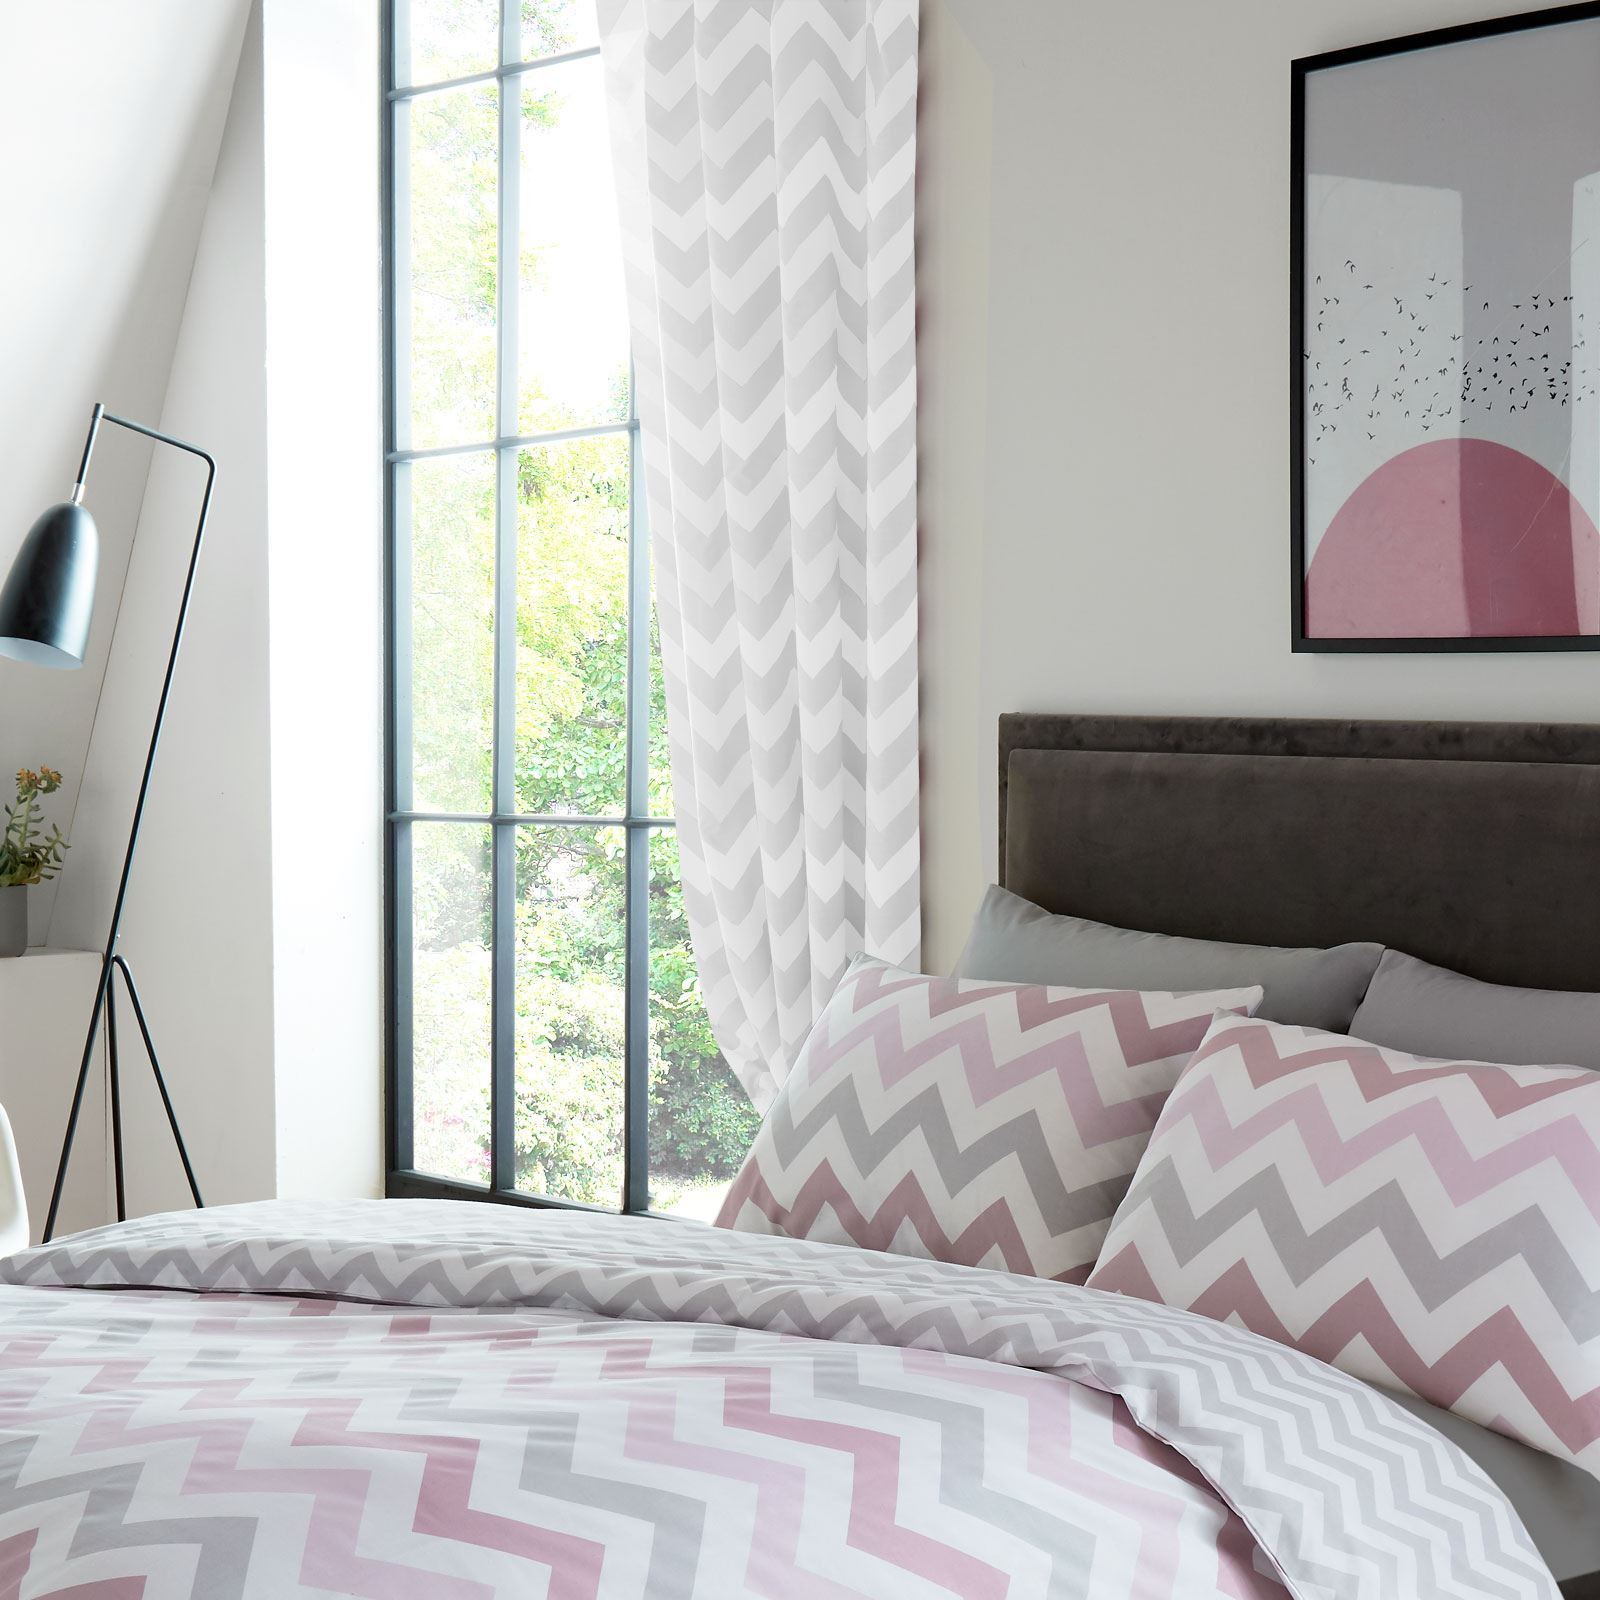 Metro Chevron Single Duvet Cover Set Pink Grey White Geometric